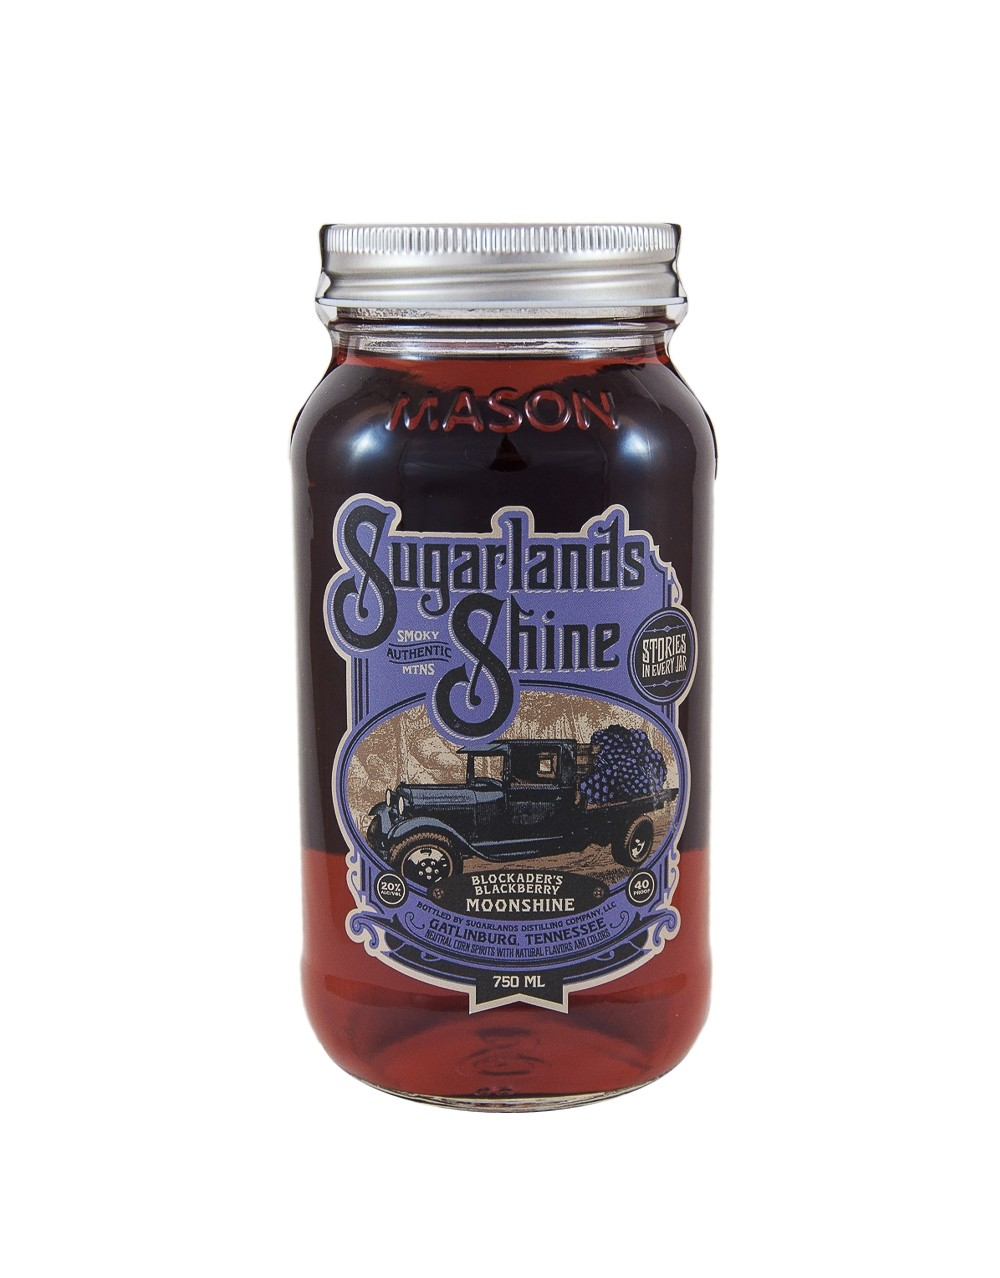 Sugarlands Blockader's Blackberry Moonshine